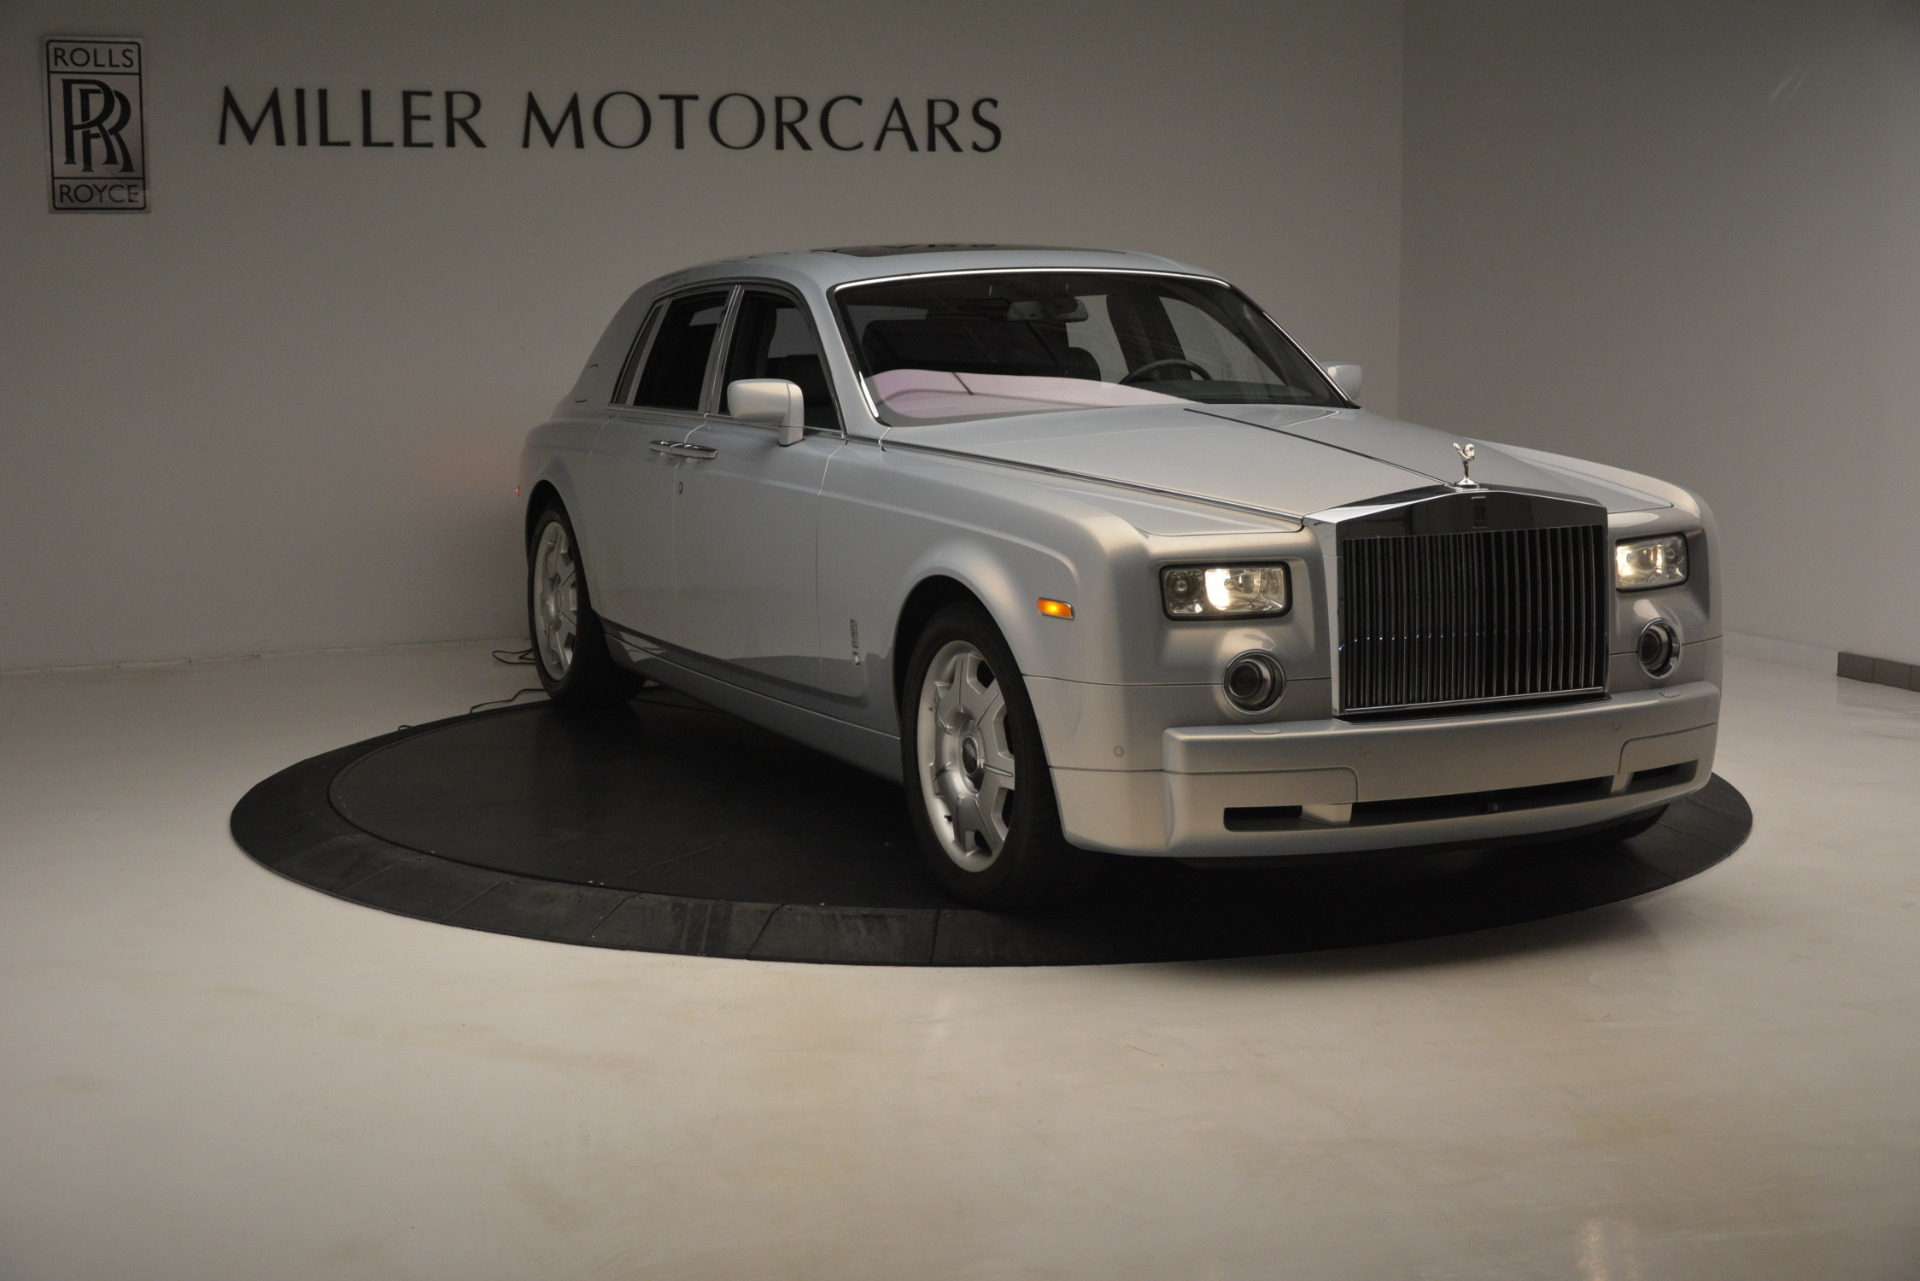 Used 2007 Rolls-Royce Phantom  For Sale In Greenwich, CT 3089_p4